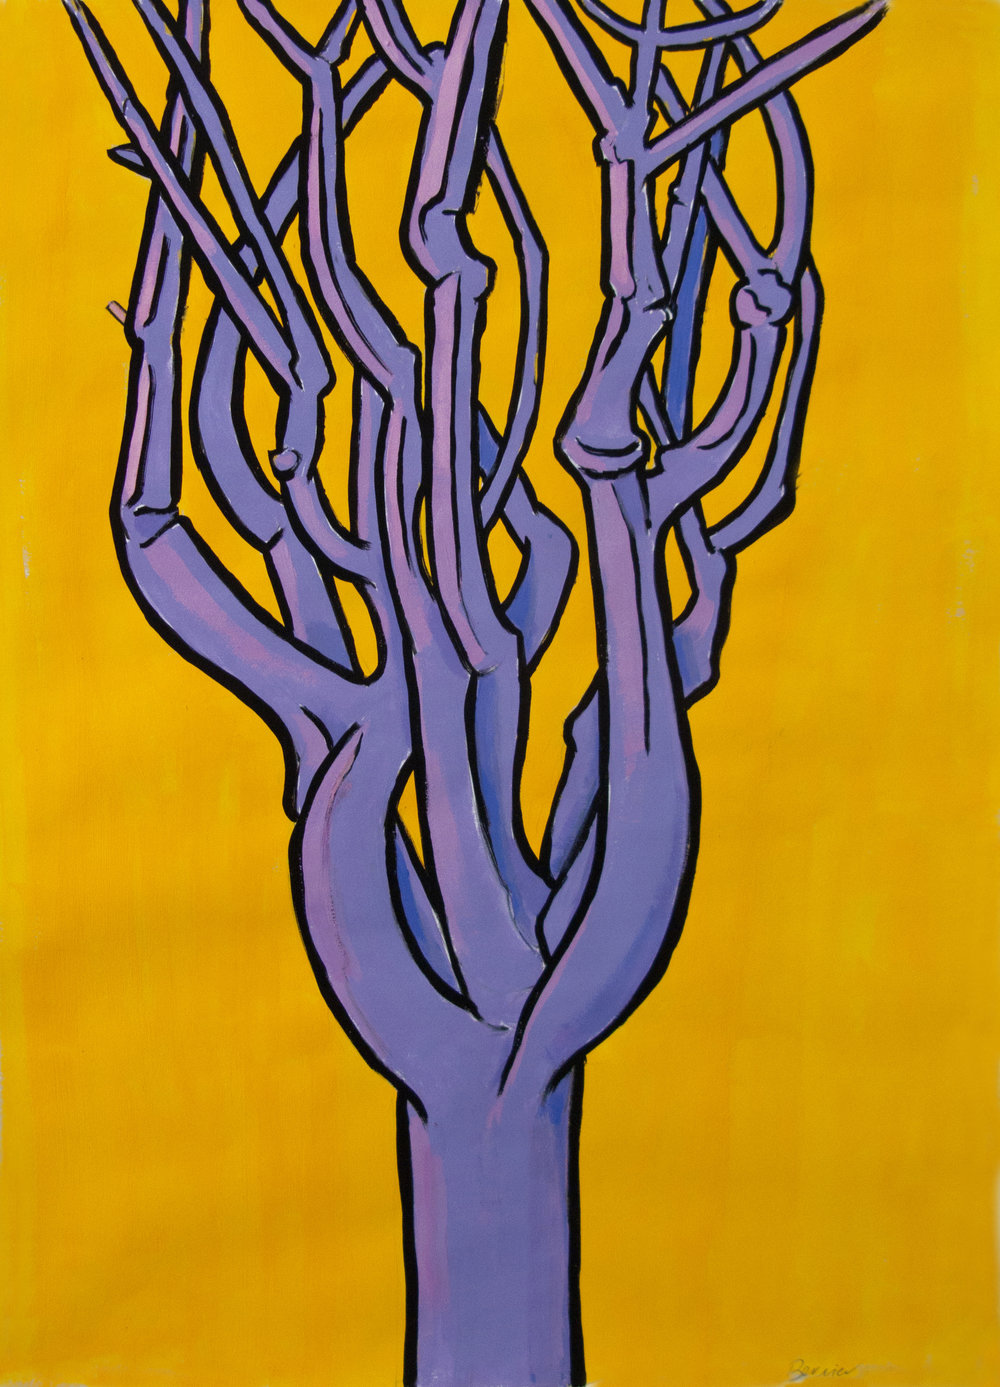 Purple Pine (Orange Background) , 24 x 19 inches, gouache, 2016